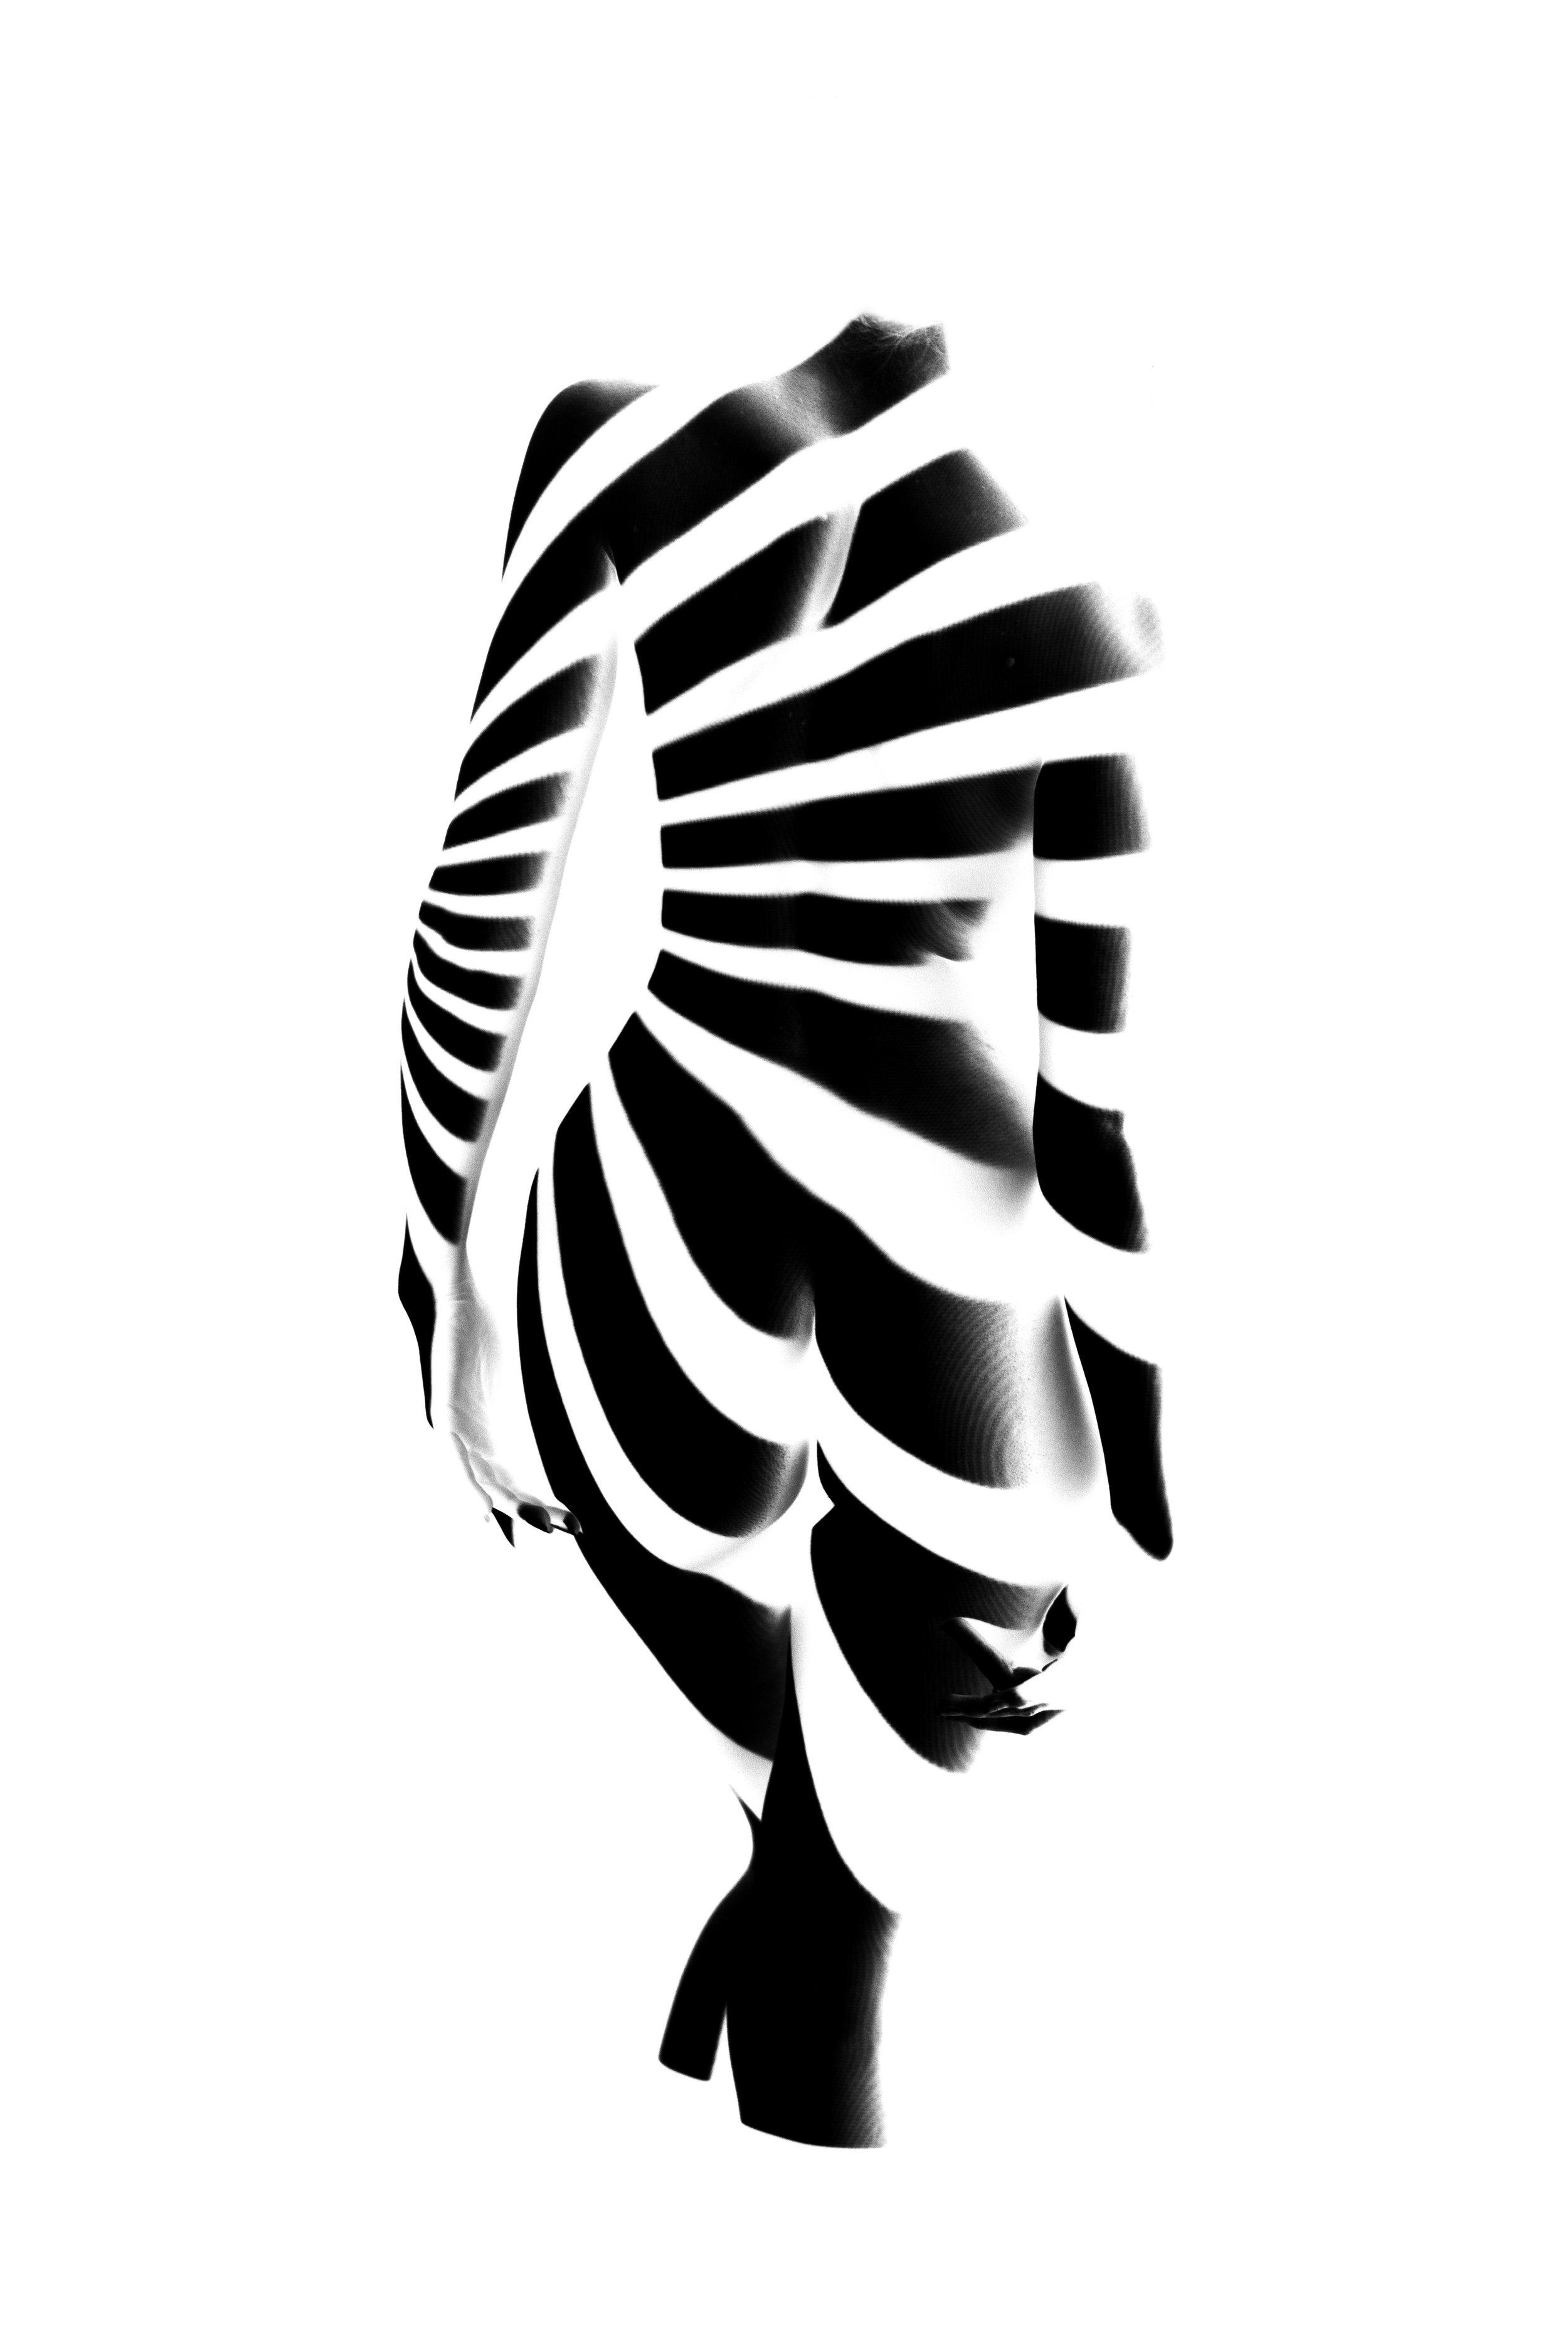 Aaron Patton - Taper - 20inx30in - Framed Giclee Print - 1 of 3 - 2015 - $1800.jpg